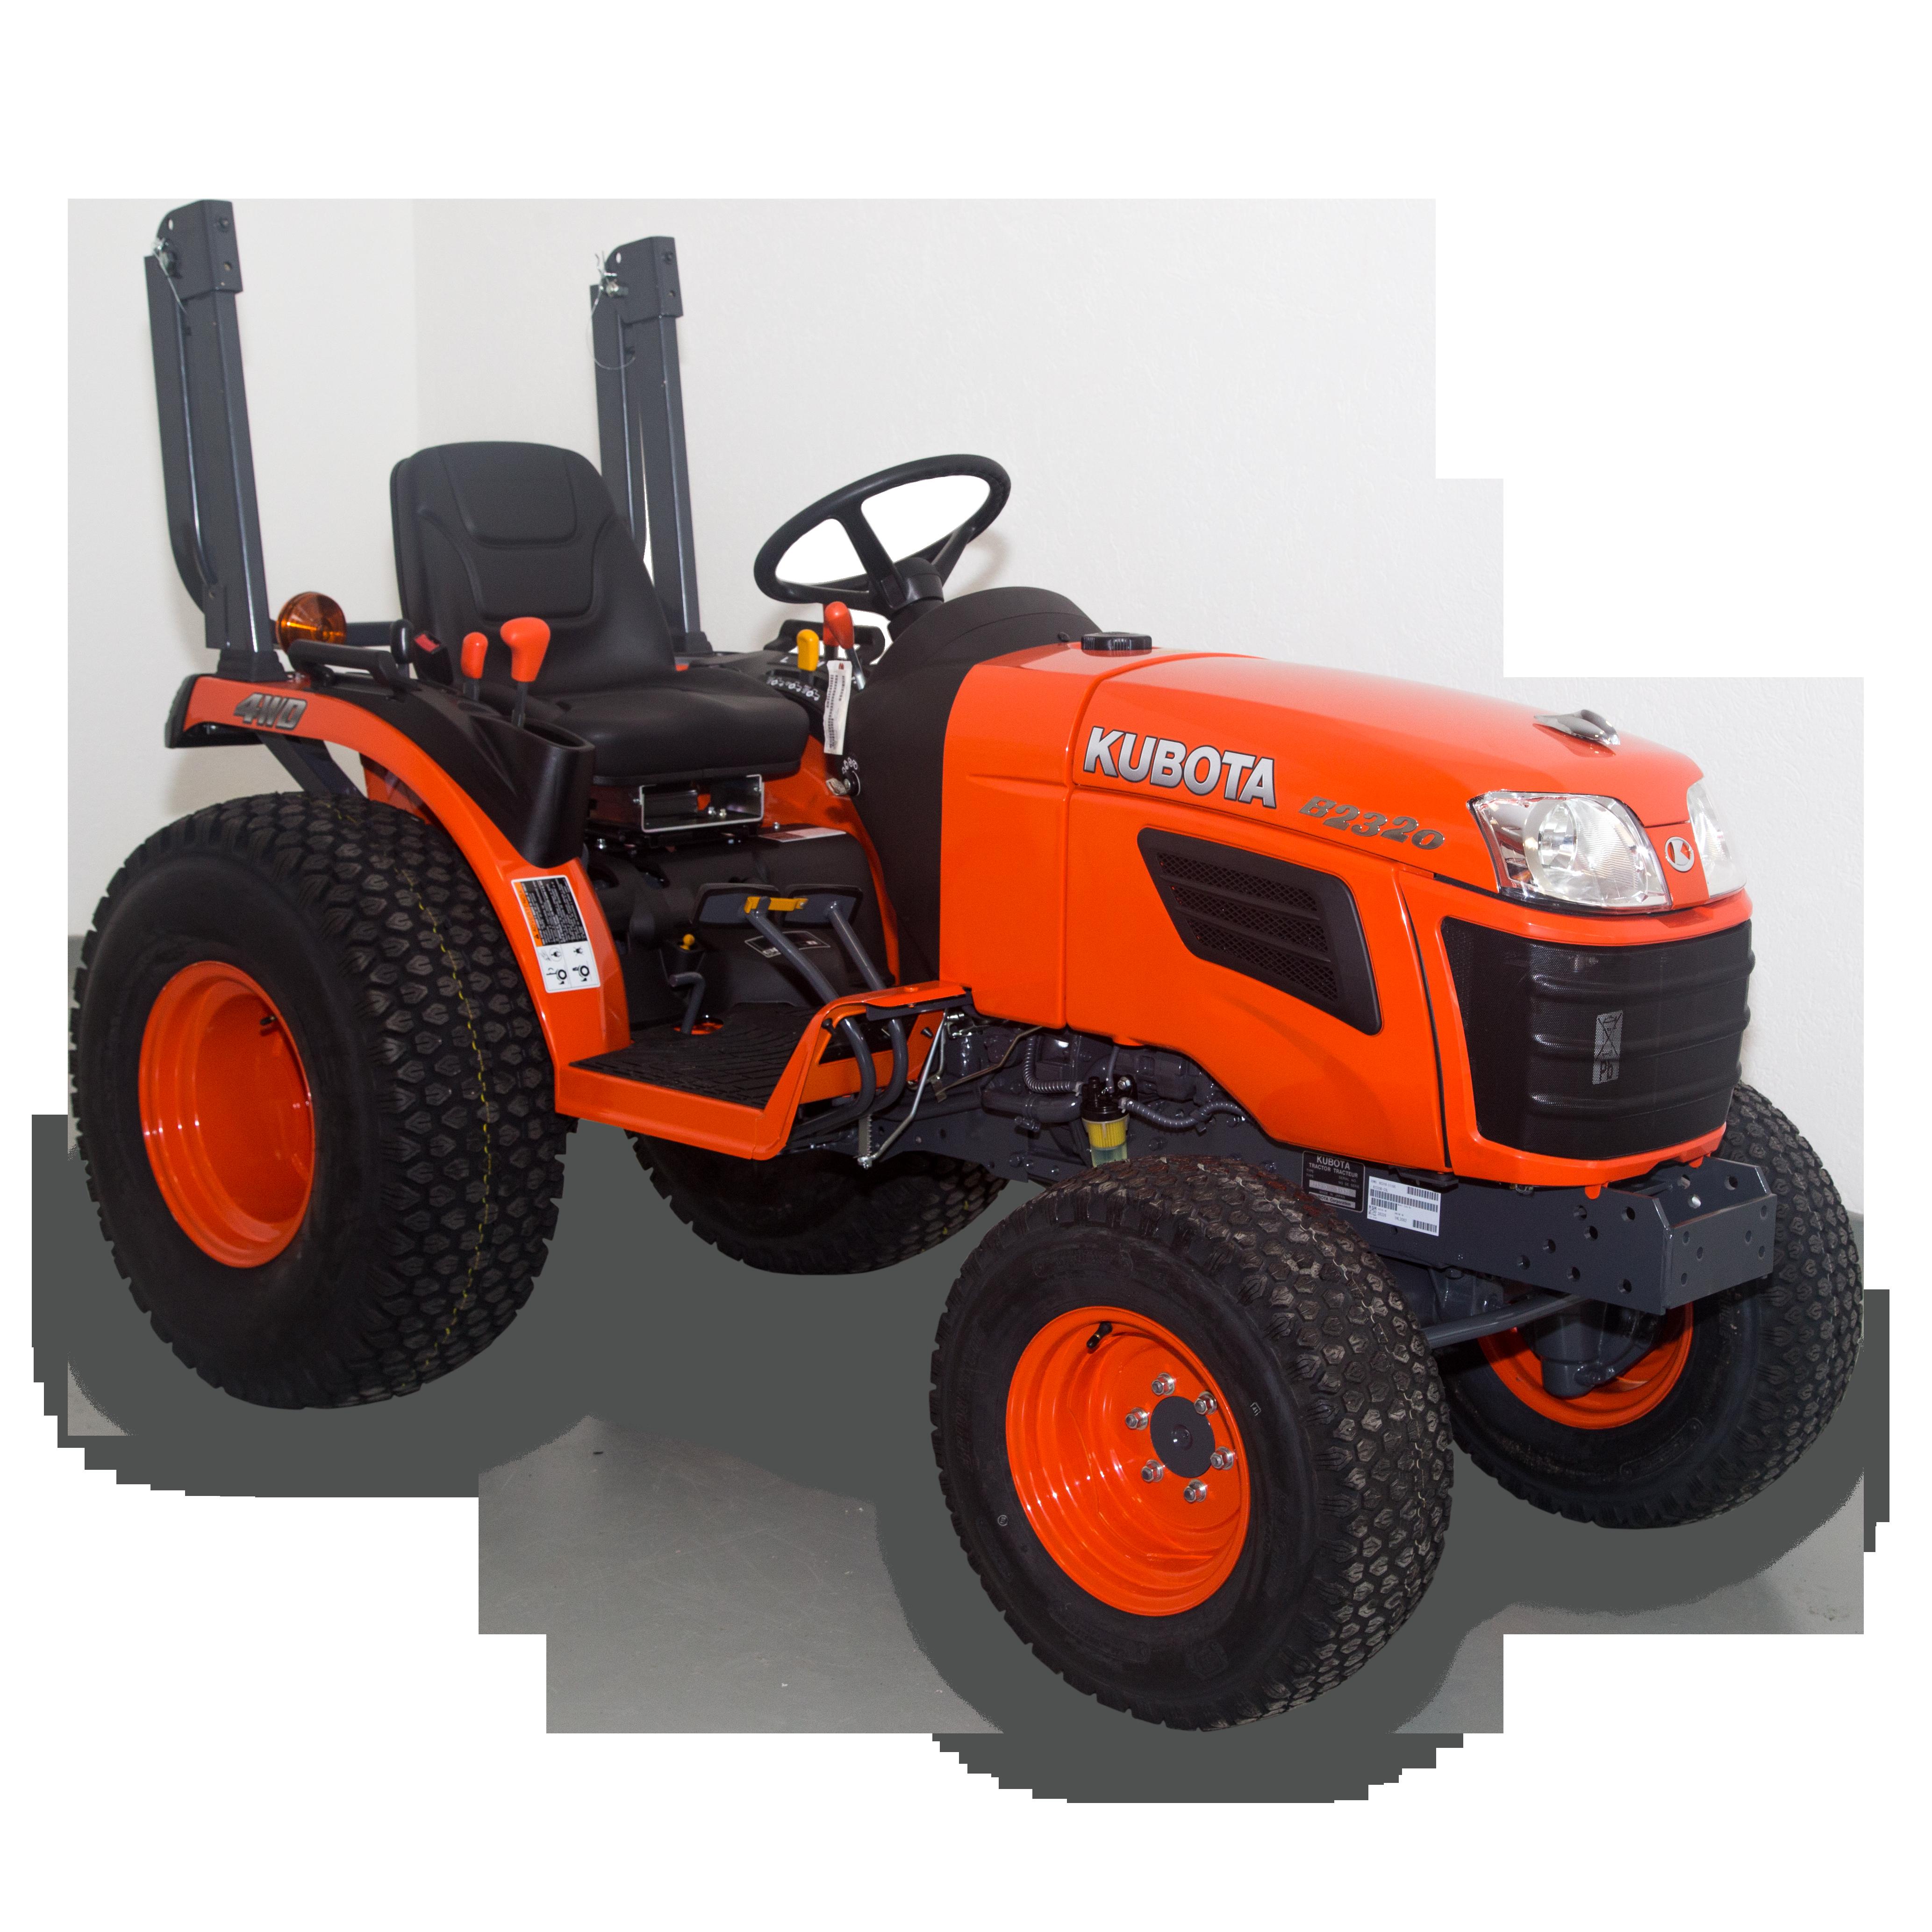 Tractor B2320 turf